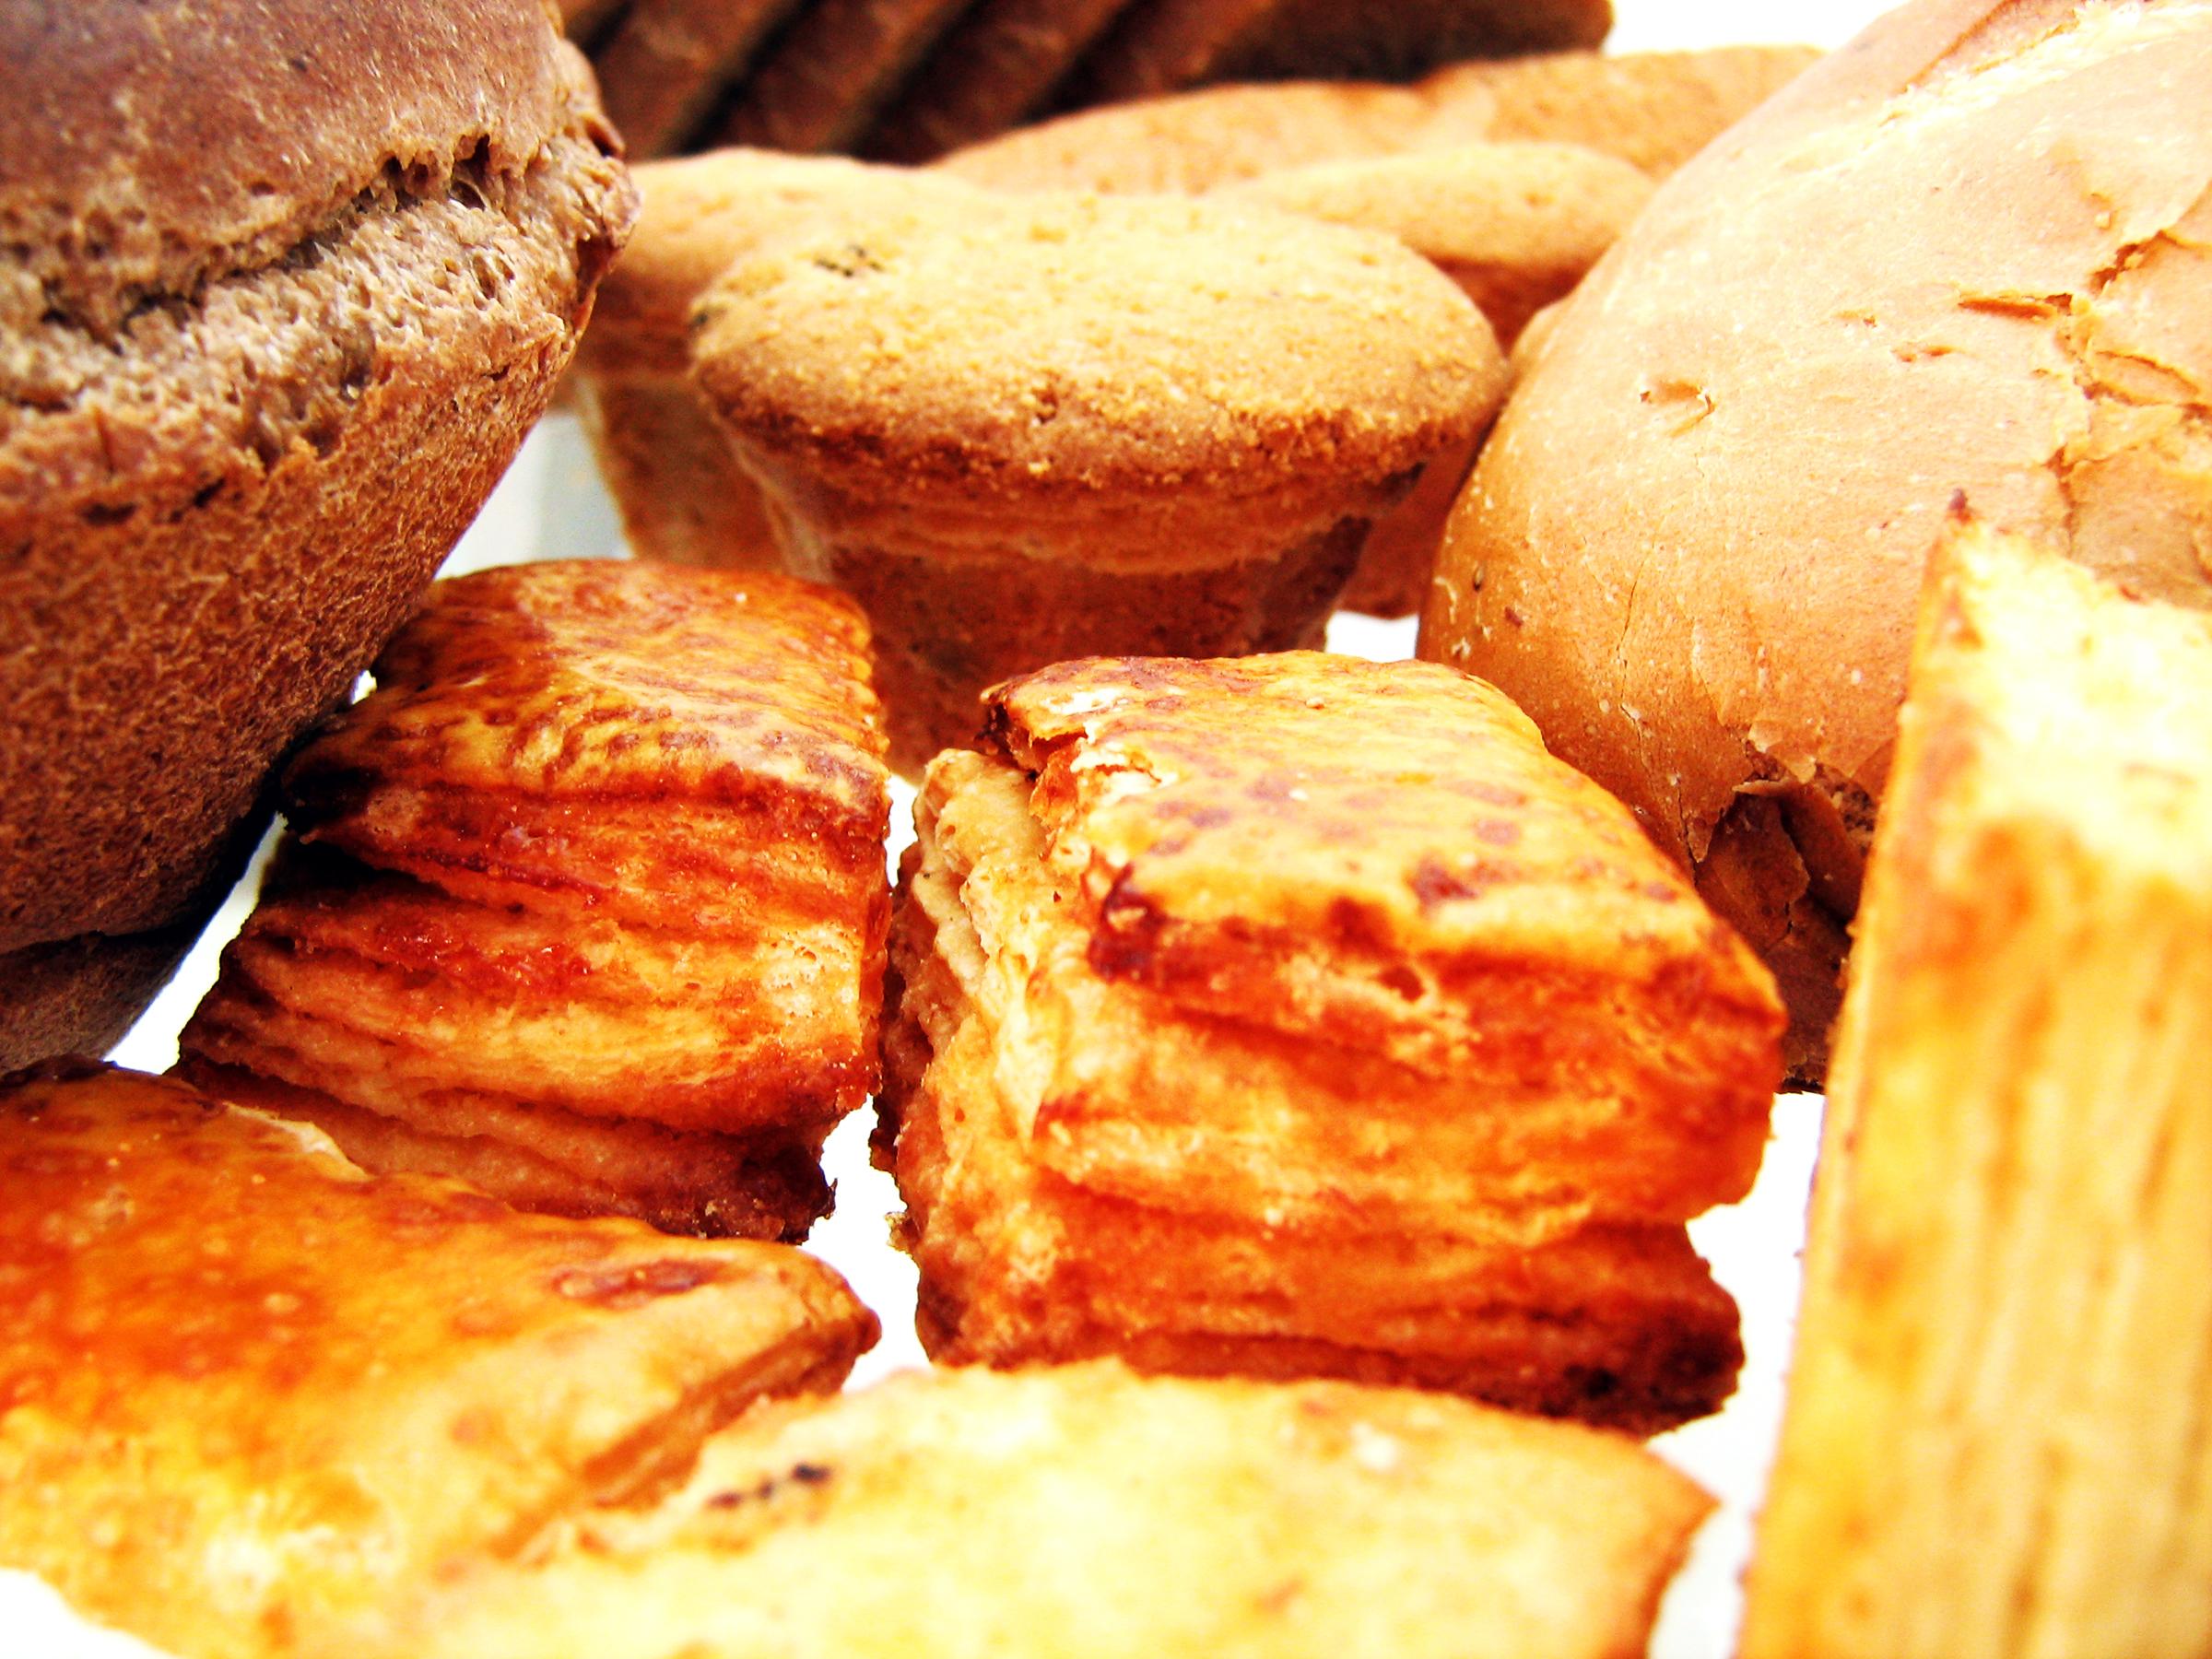 Buns, Baked, Bread, Bun, Food, HQ Photo